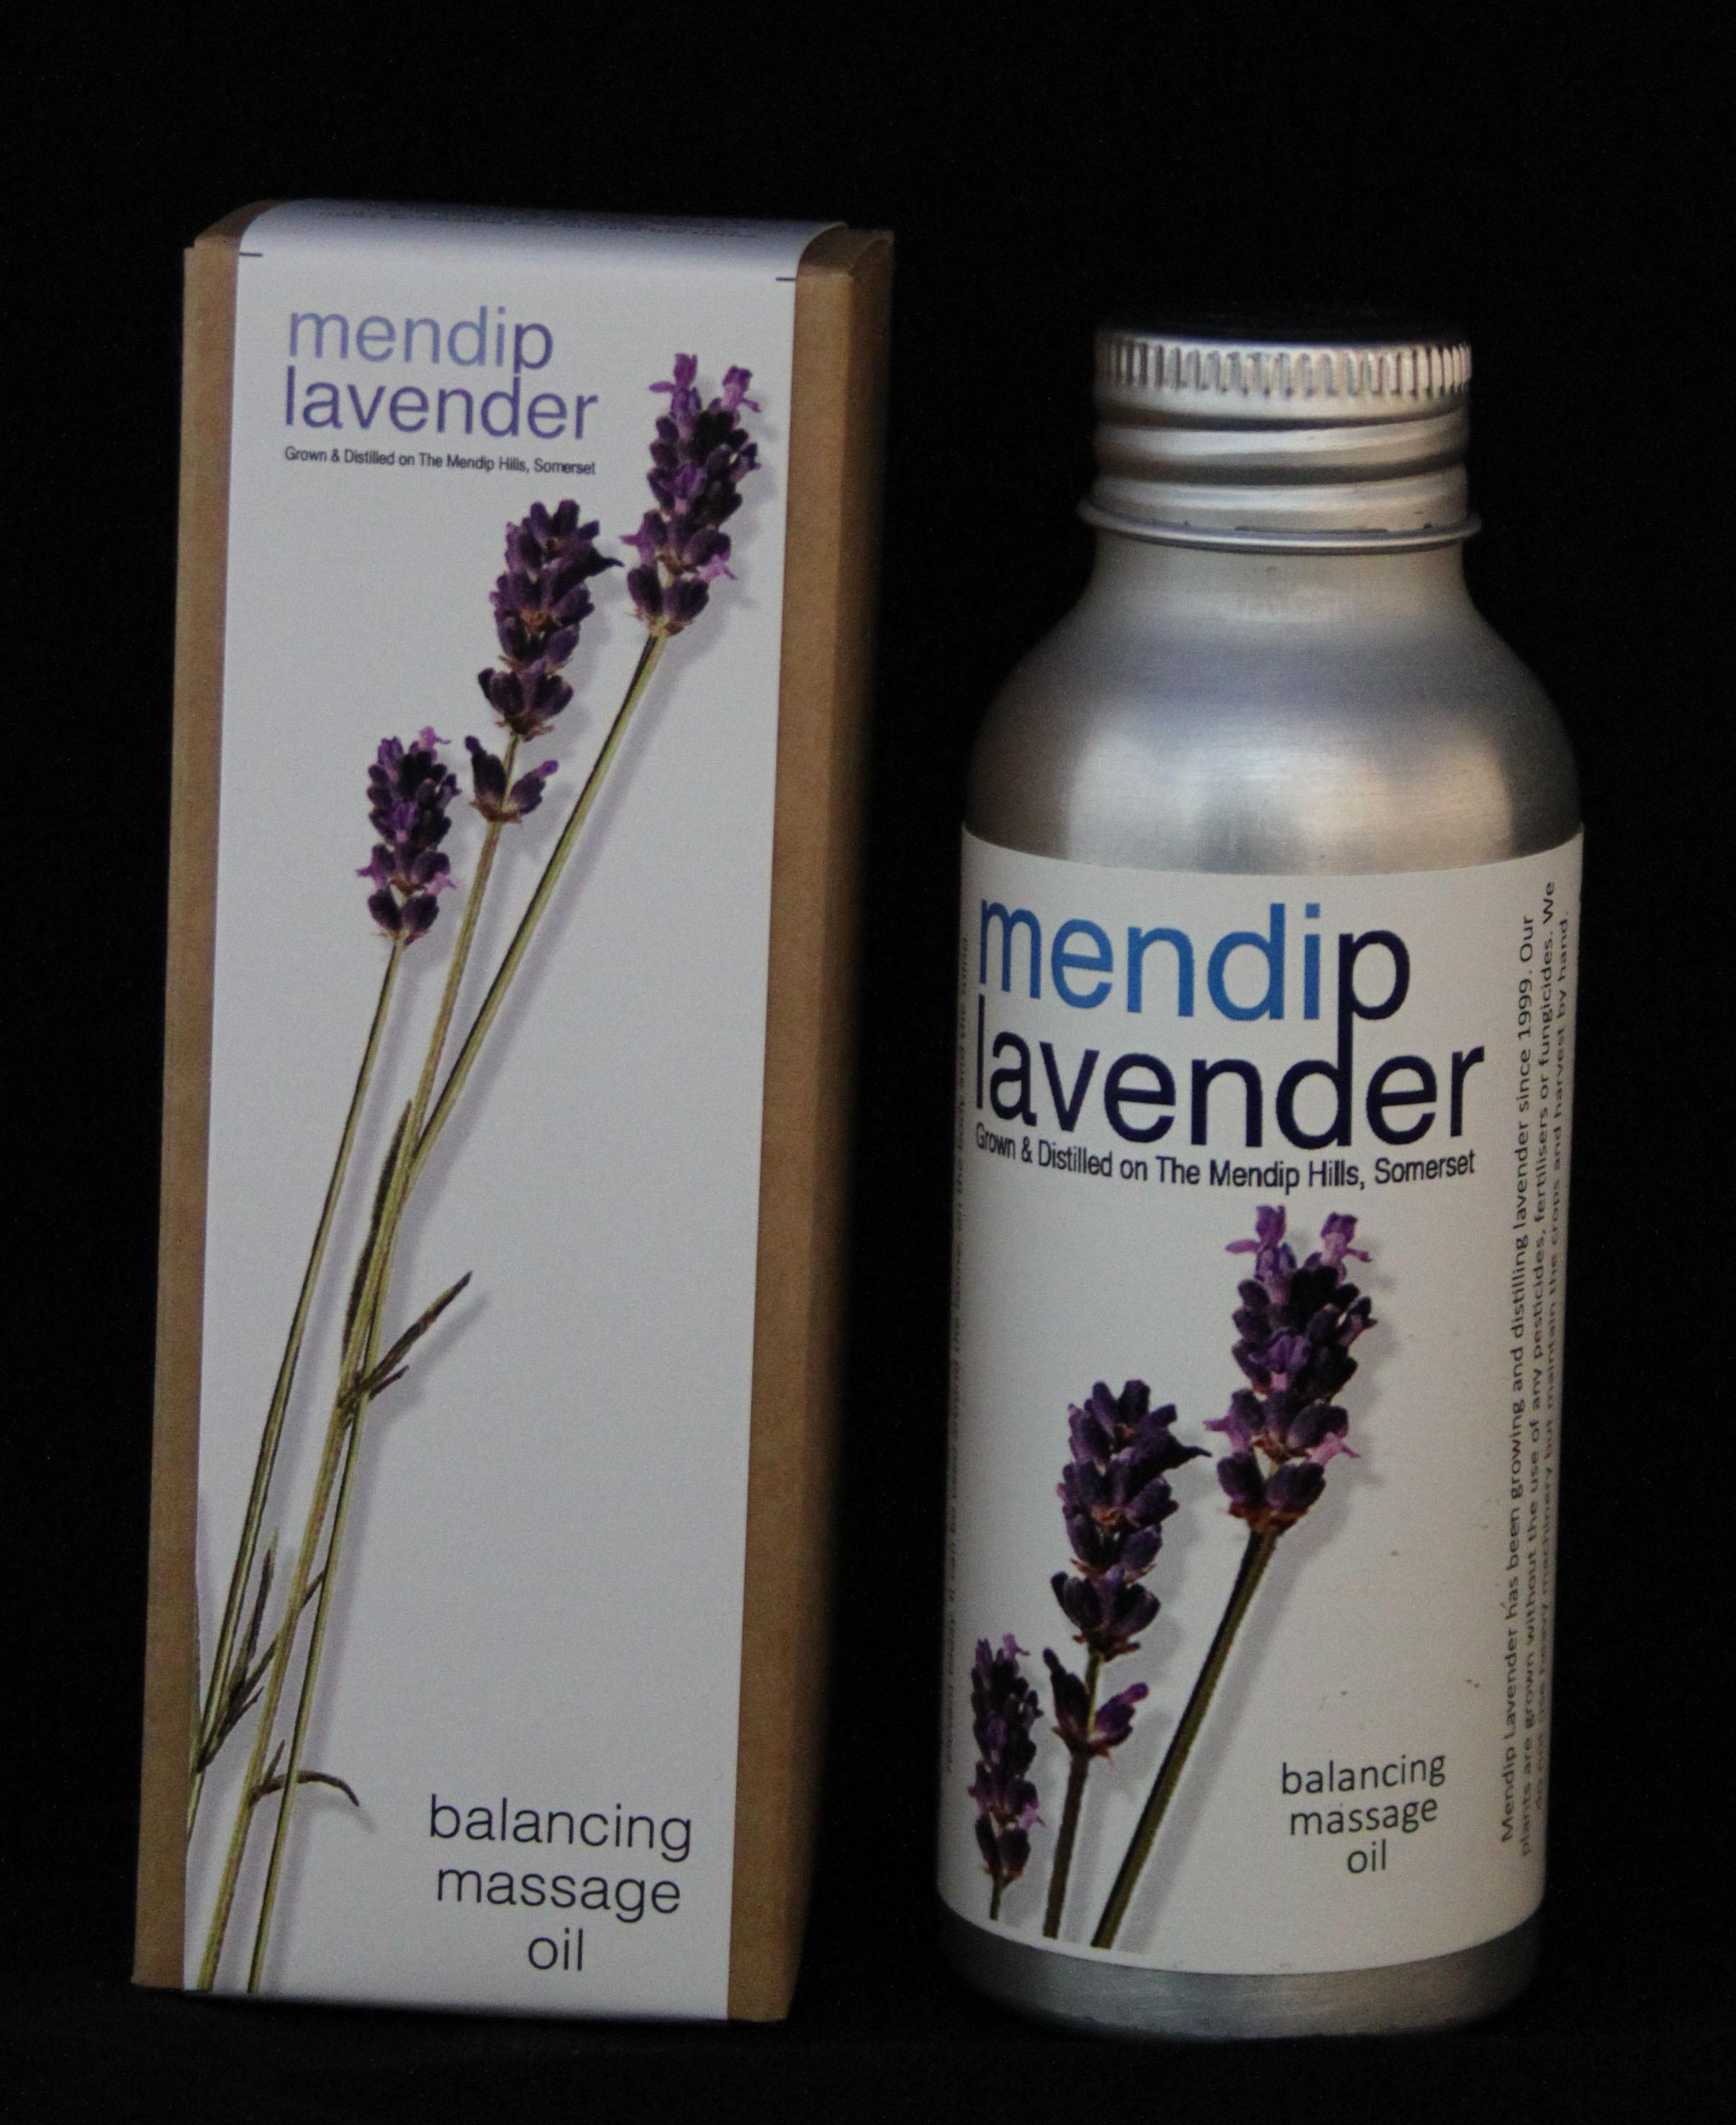 Balancing Massage Oil